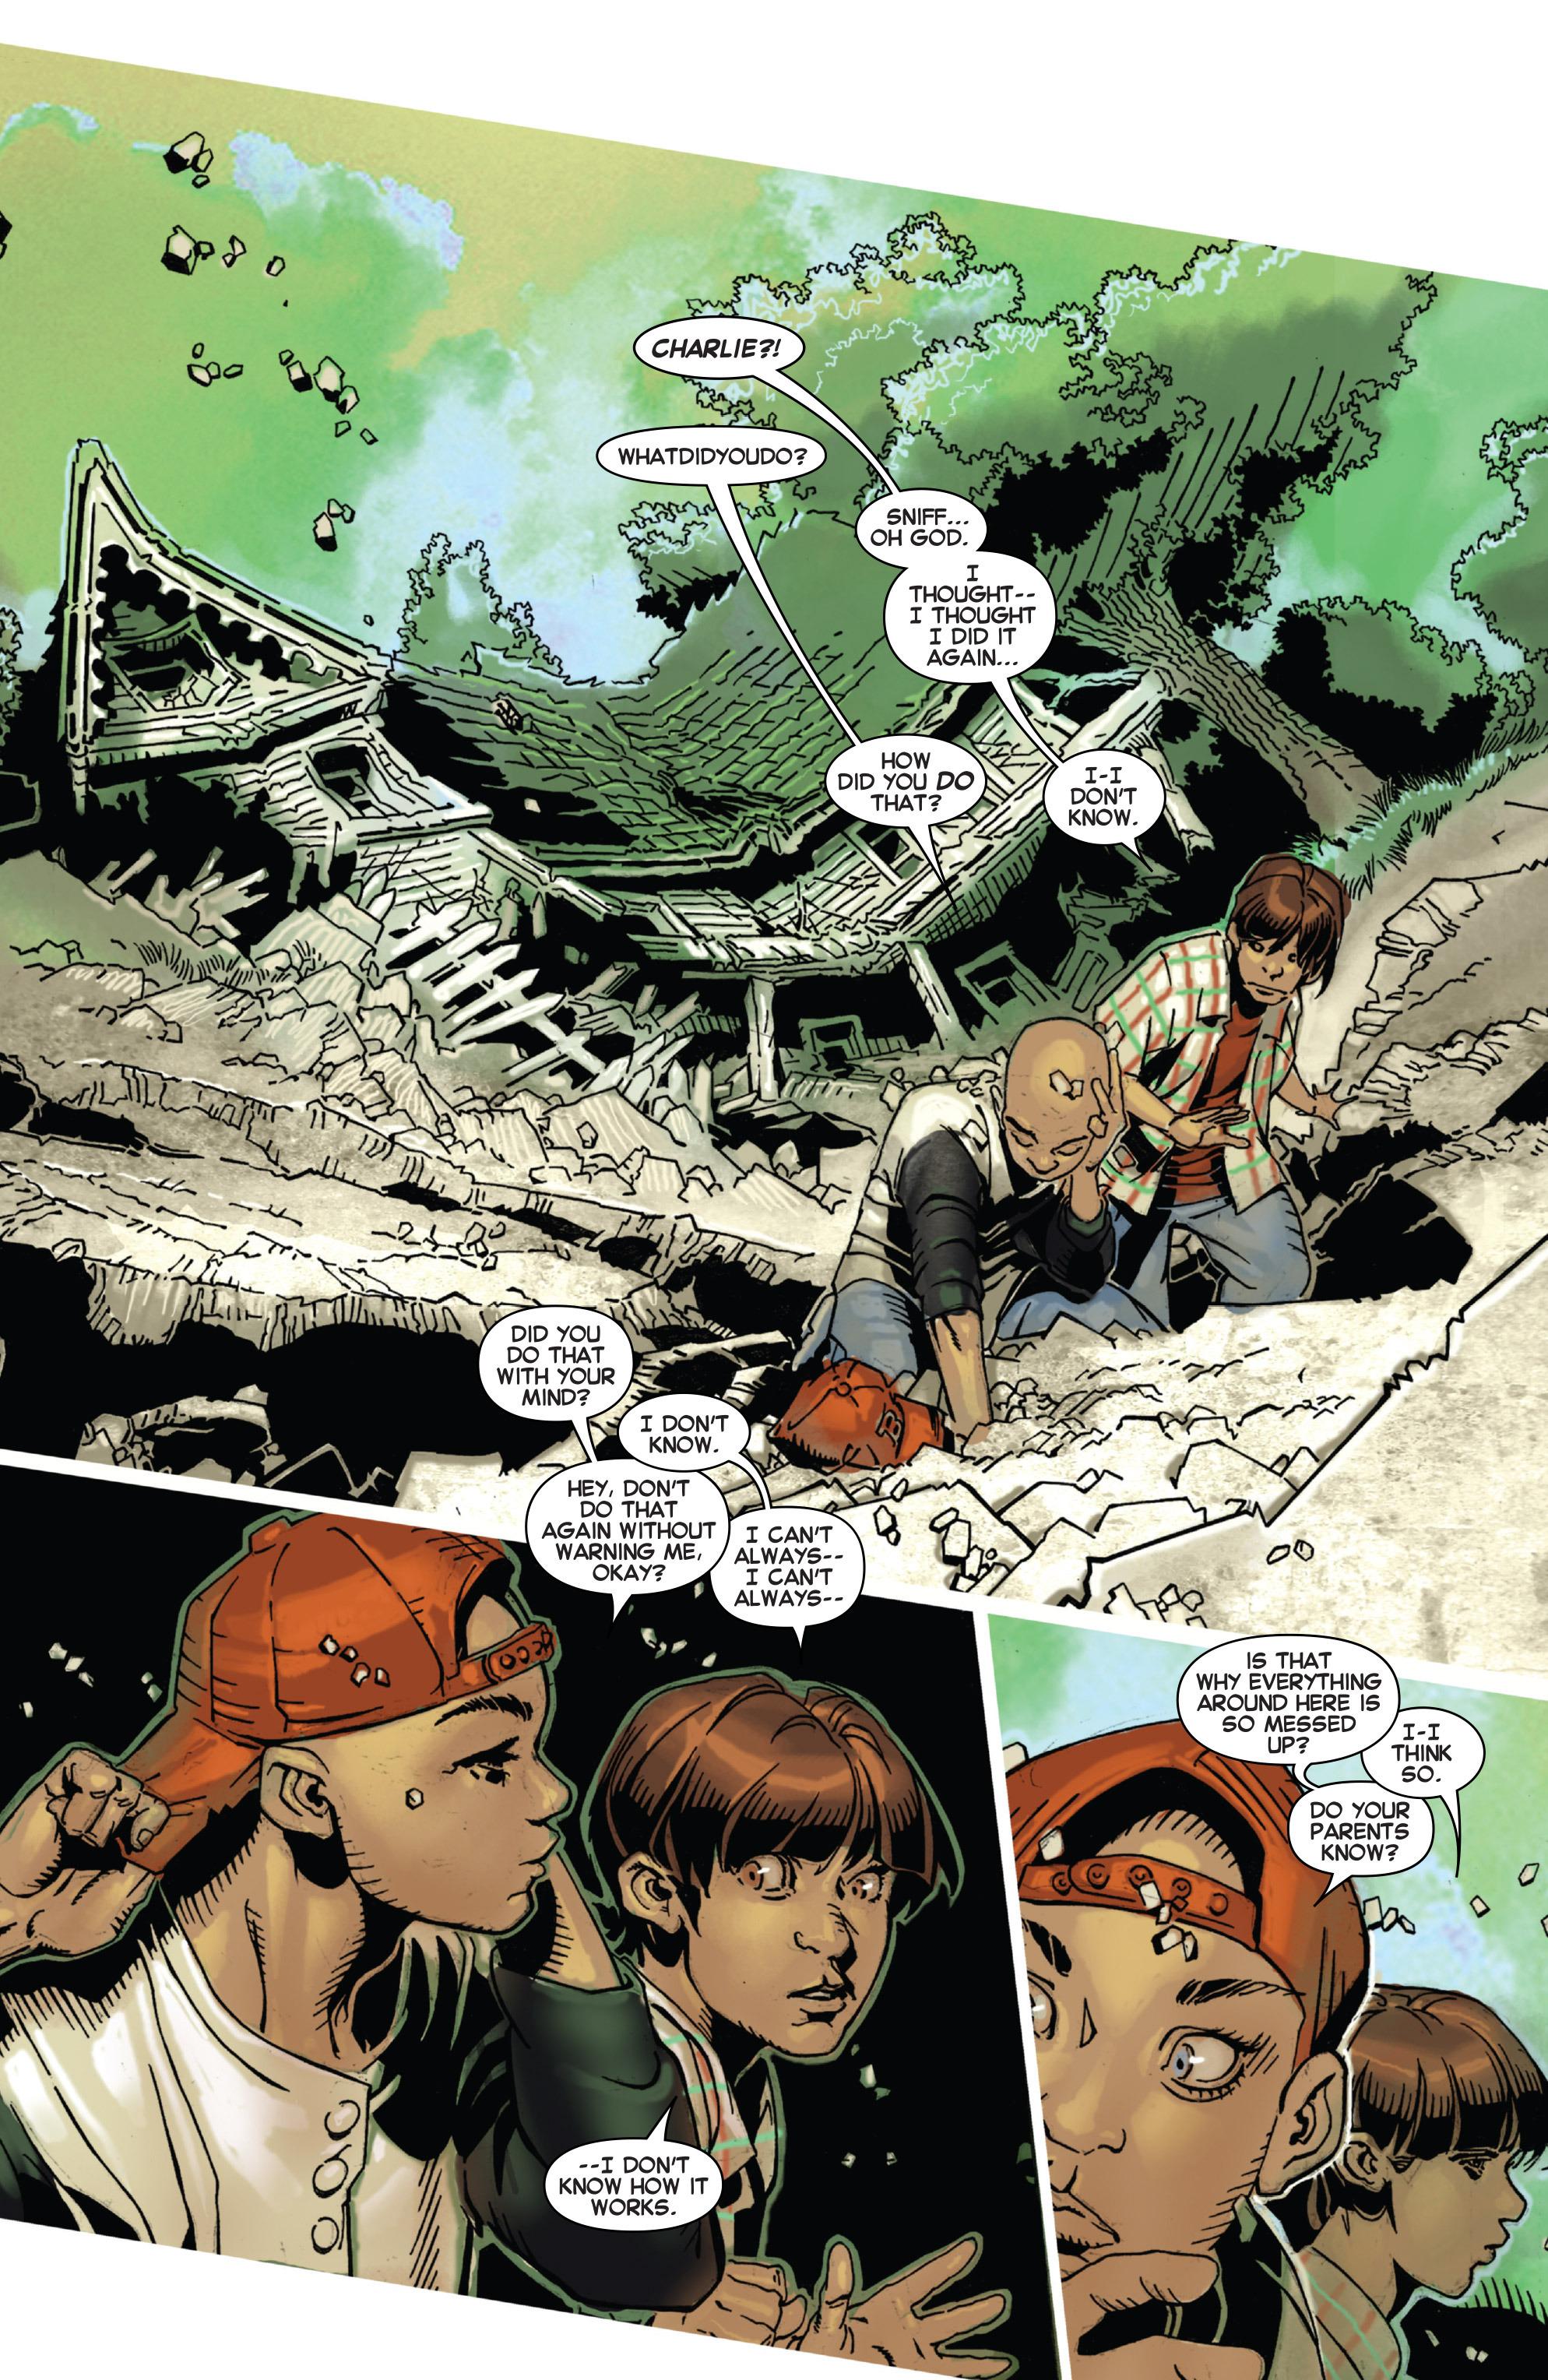 Read online Uncanny X-Men (2013) comic -  Issue # _TPB 4 - vs. S.H.I.E.L.D - 131